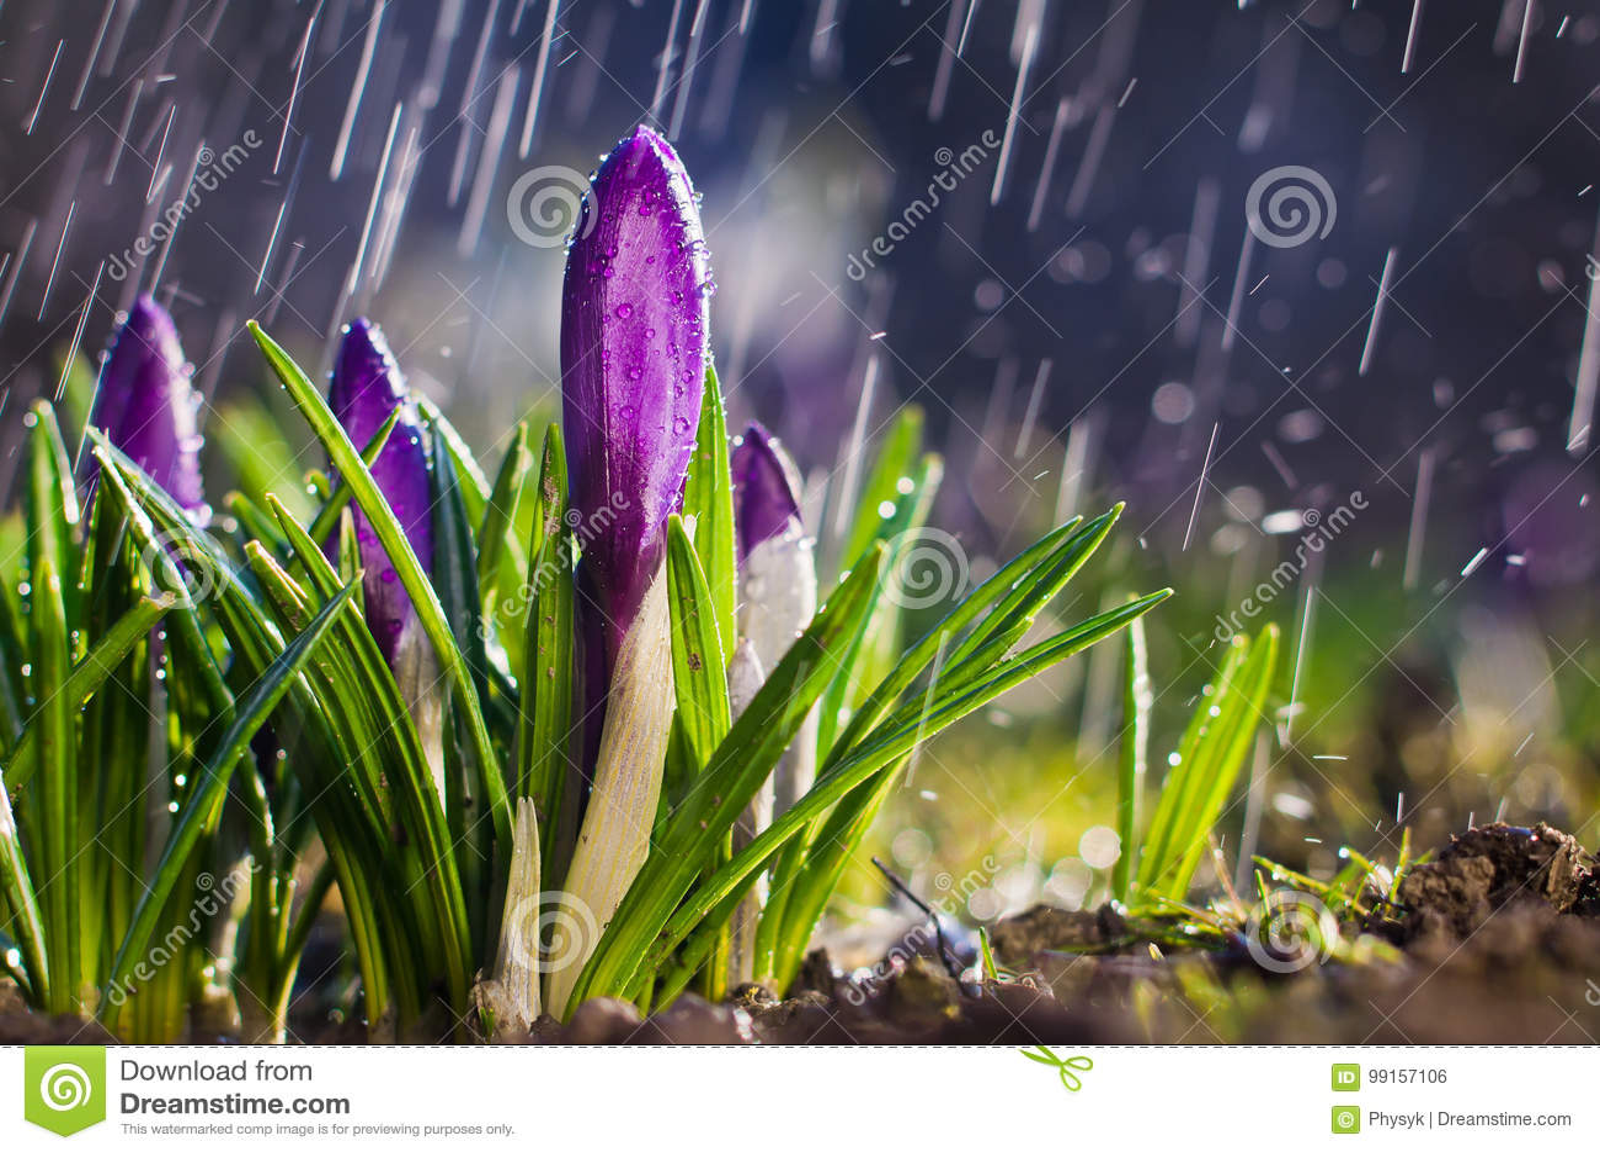 https://thumbs.dreamstime.com/z/first-spring-flowers-spring-flower-blue-purple-crocuses-sunny-day-spray-water-spring-flower-blue-purple-crocuses-99157106.jpg